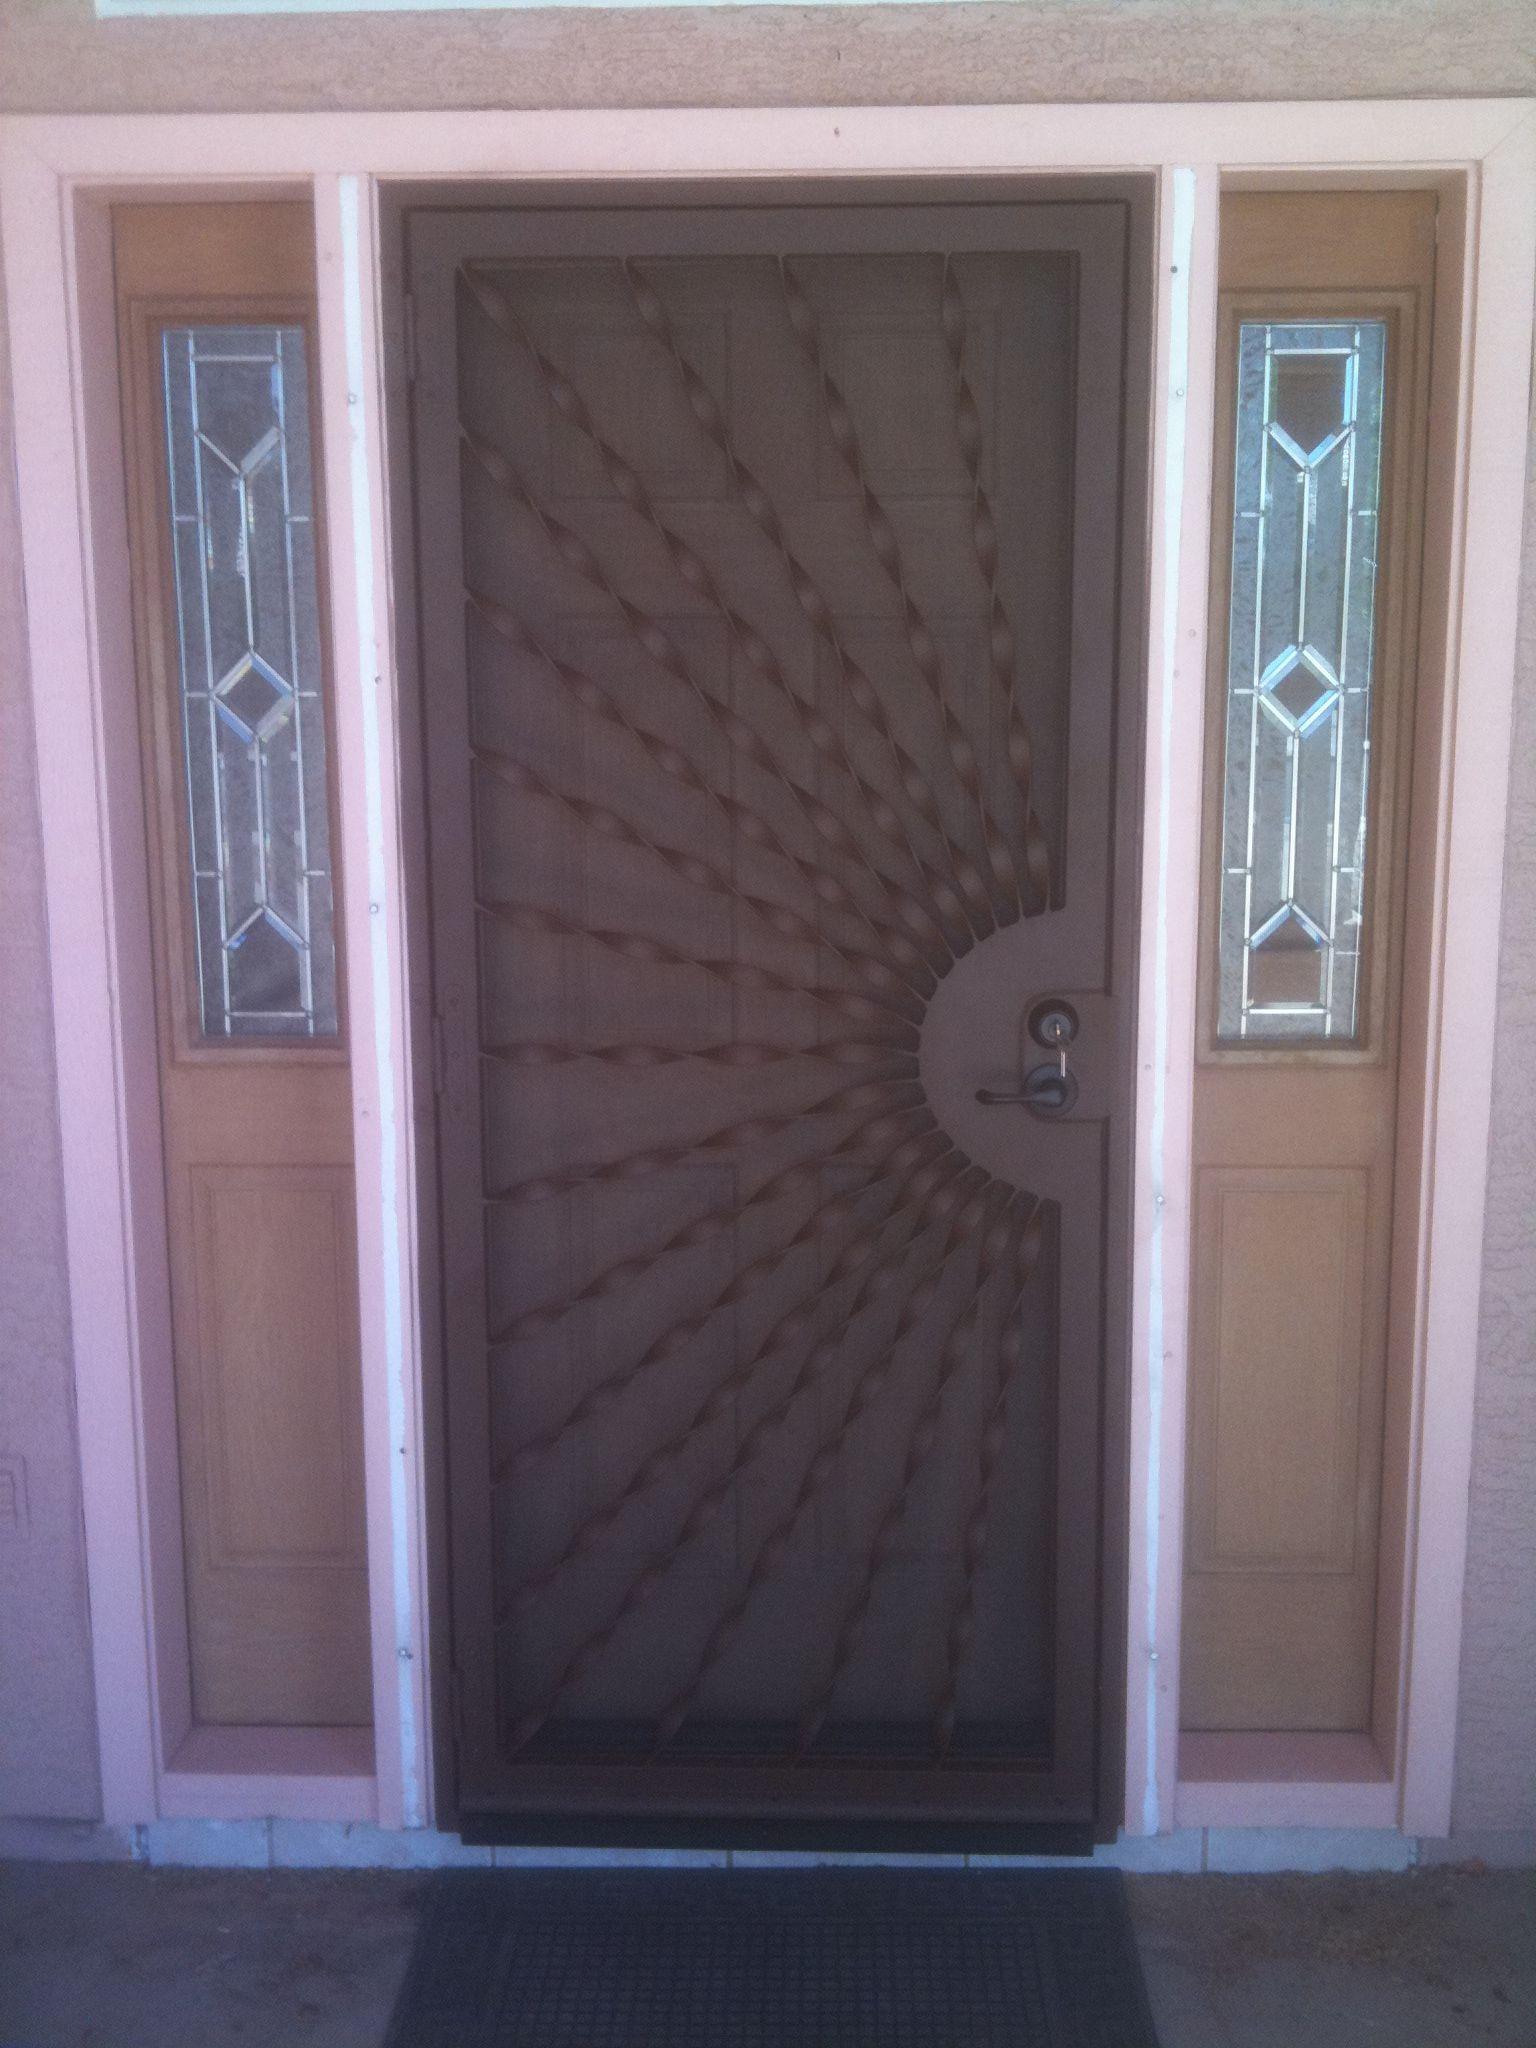 Decorative Security Screen Doors dcs industries, custom door, security doors, custom security doors